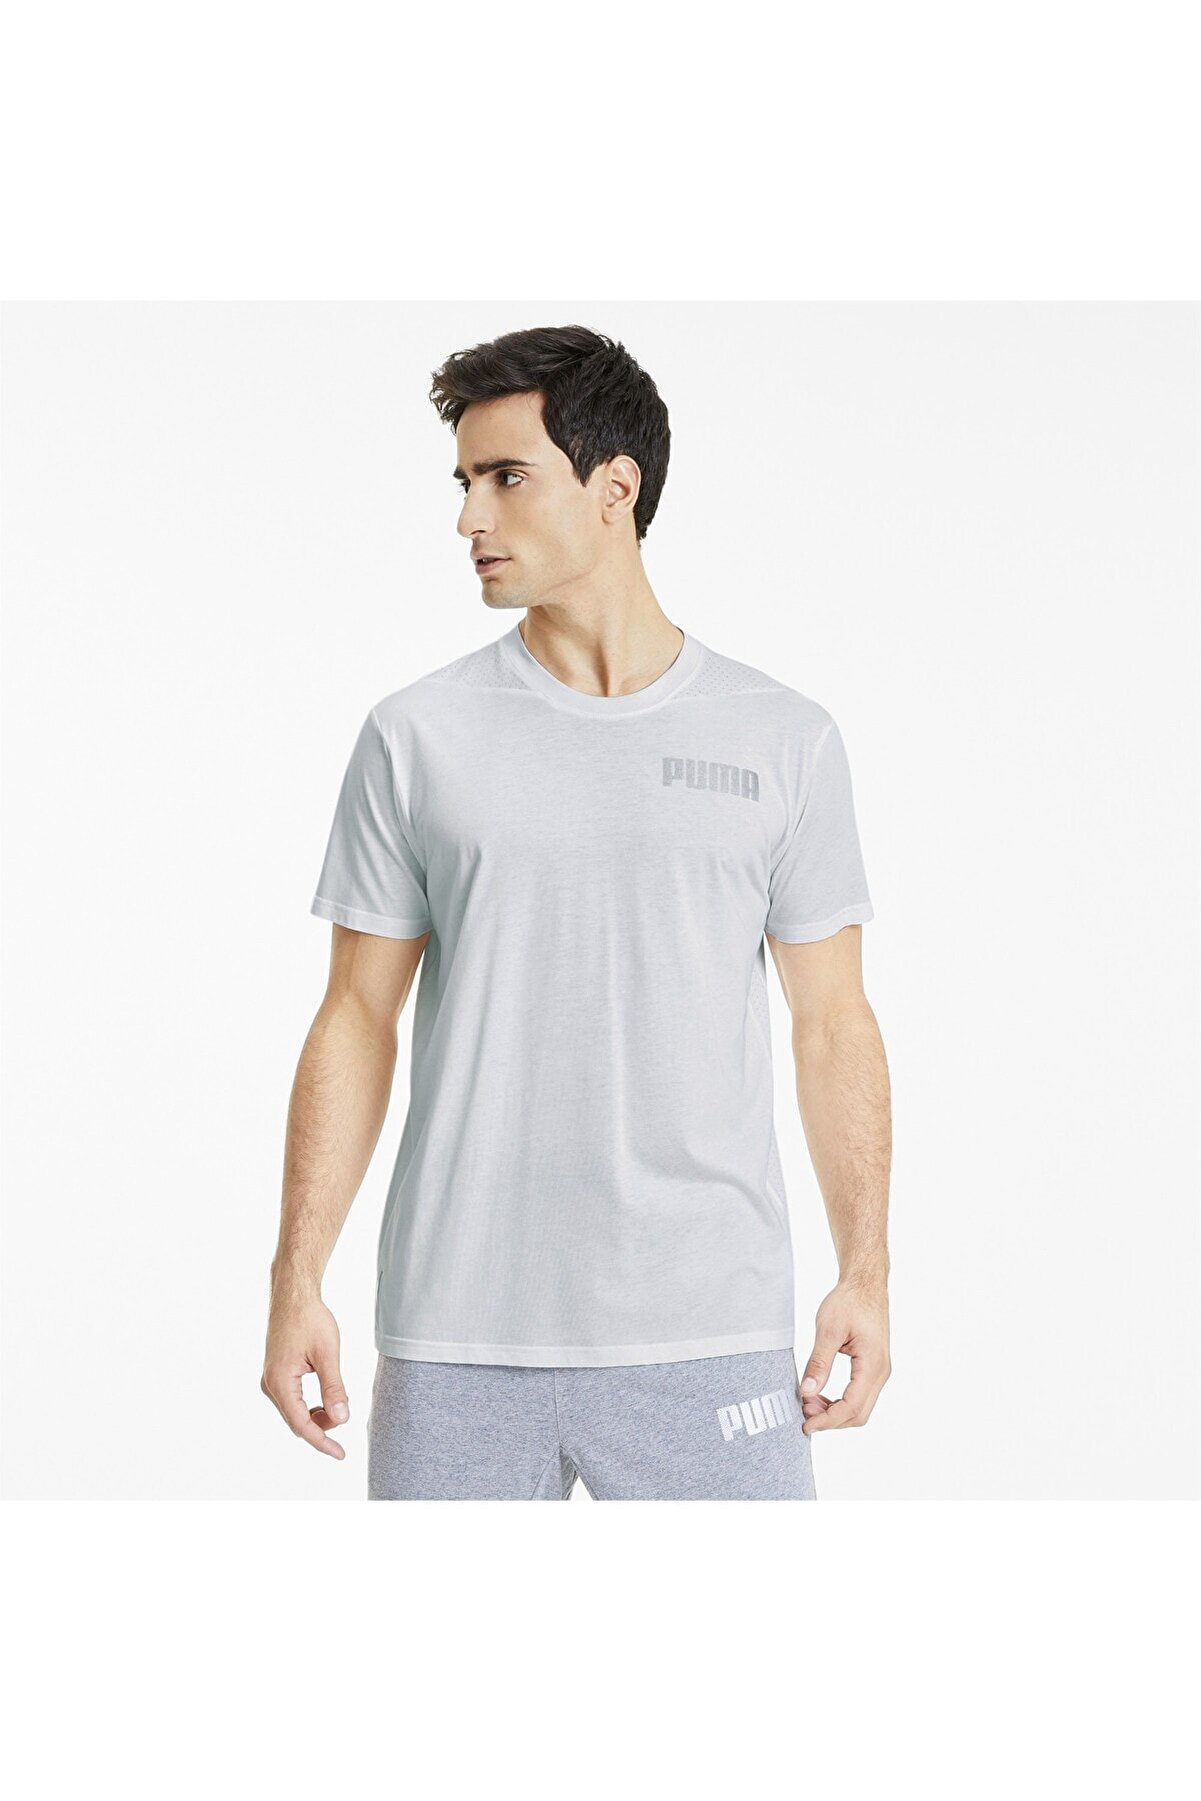 Puma Erkek Spor T-Shirt - COLLECTIVE TRI-BLEND - 51899203